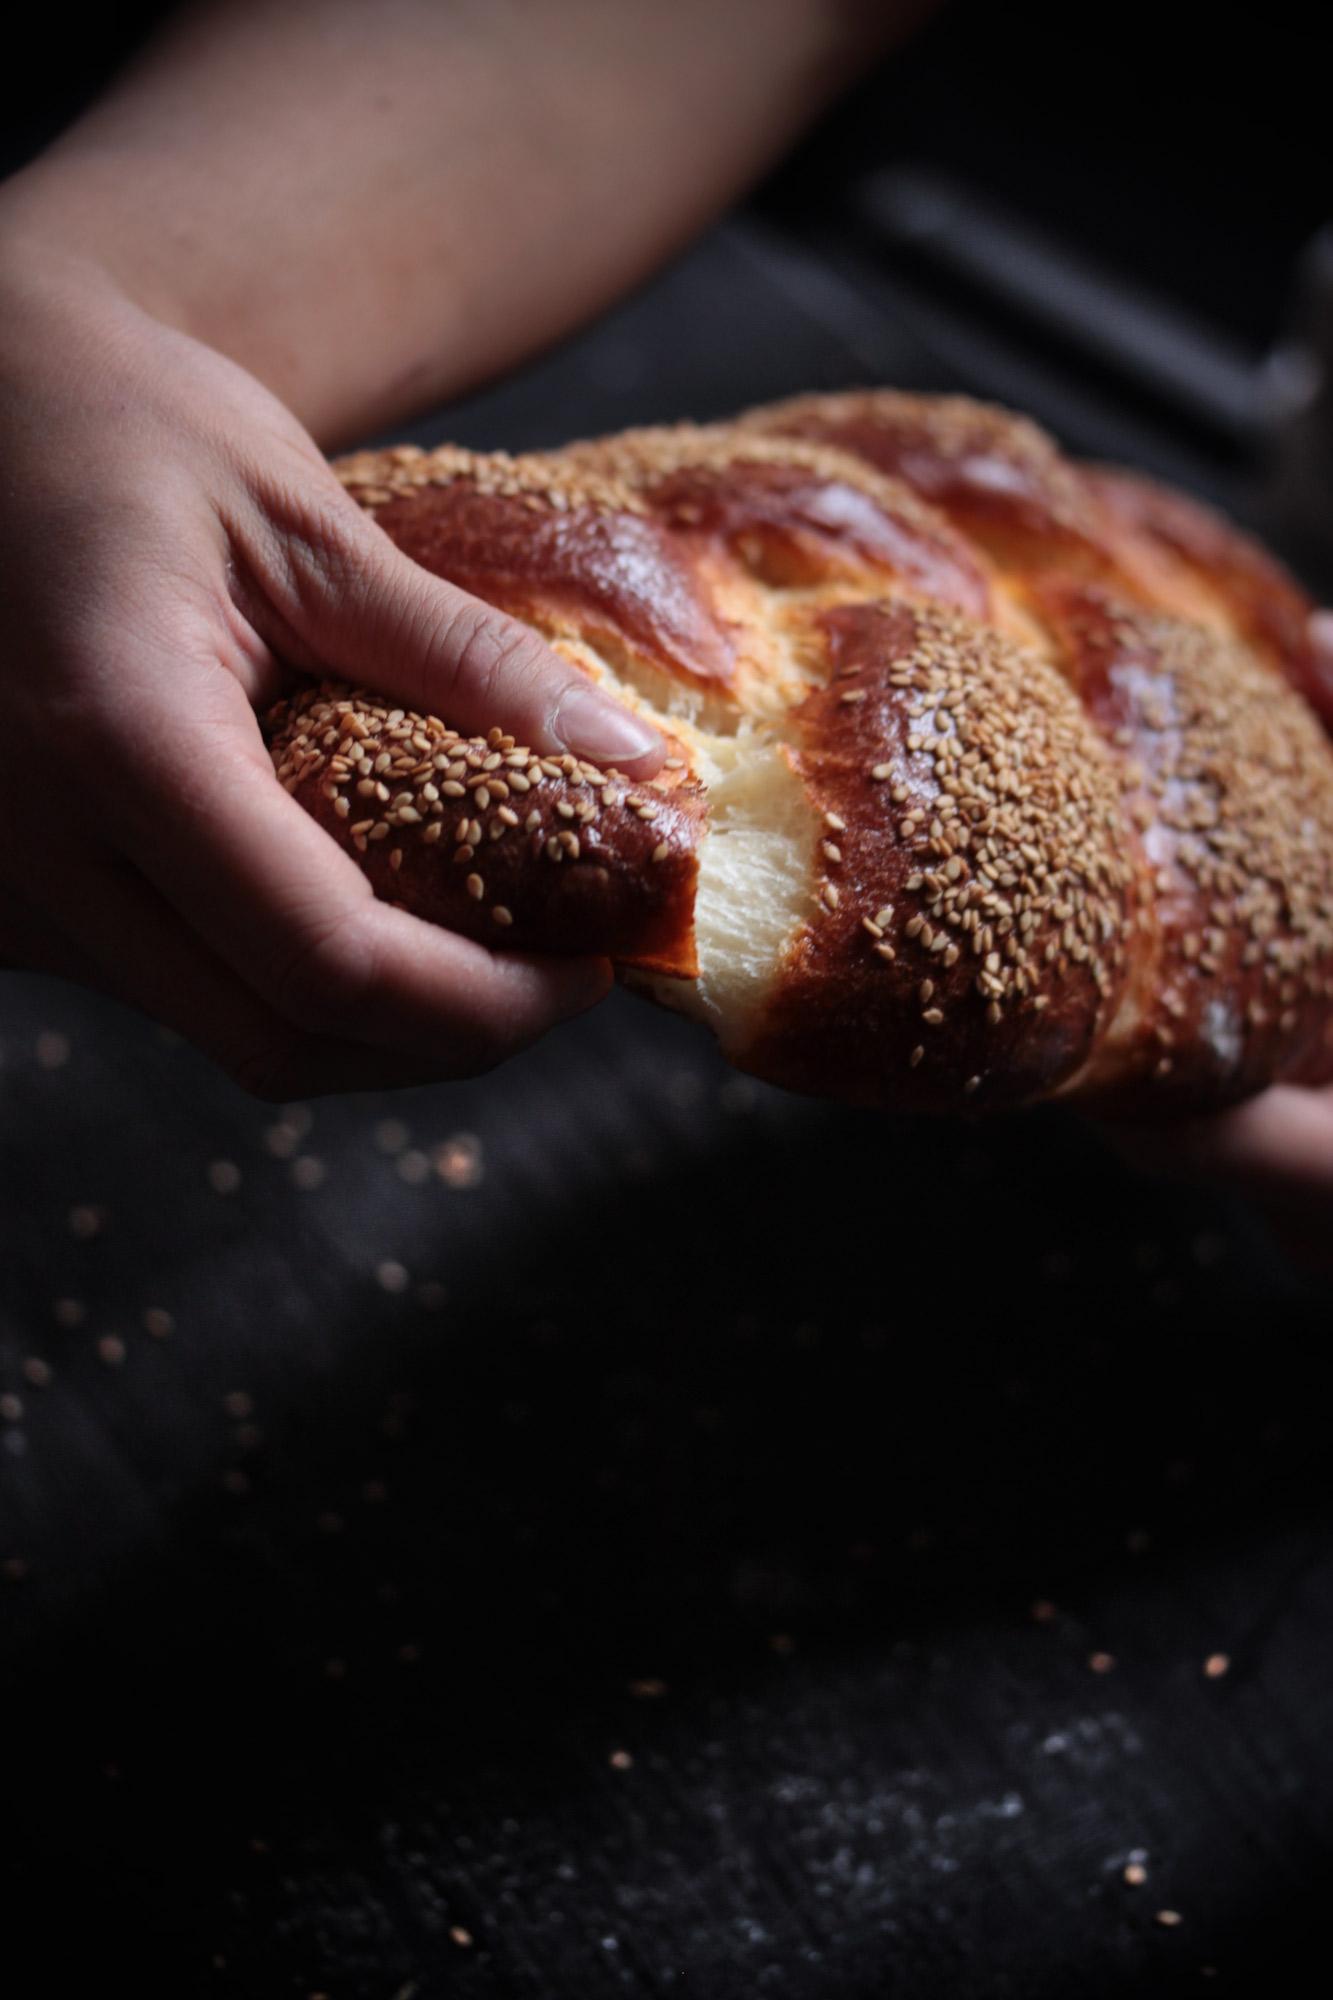 chabath chalom, shabbat, shabat, shabath, shalom, bread, halla, hallots, brioche, dessert, praliné, pralin , noisette, chocolat, easy, recette, recipe, blogger, chocolate, hazelnut, almond, sweet,chef, blogger, cooking, cake , leger , gateau , light, chabath , shabath , parvé, dairyfree, sans lactoses , bread, homemade, freshly baked, recipe, pain , pain de mie, loaf, MAP, recette, blog, blogger, donut, beignet, hannouca, doughnut, hanouka, sucre, doughnut, donkindonu, donut,